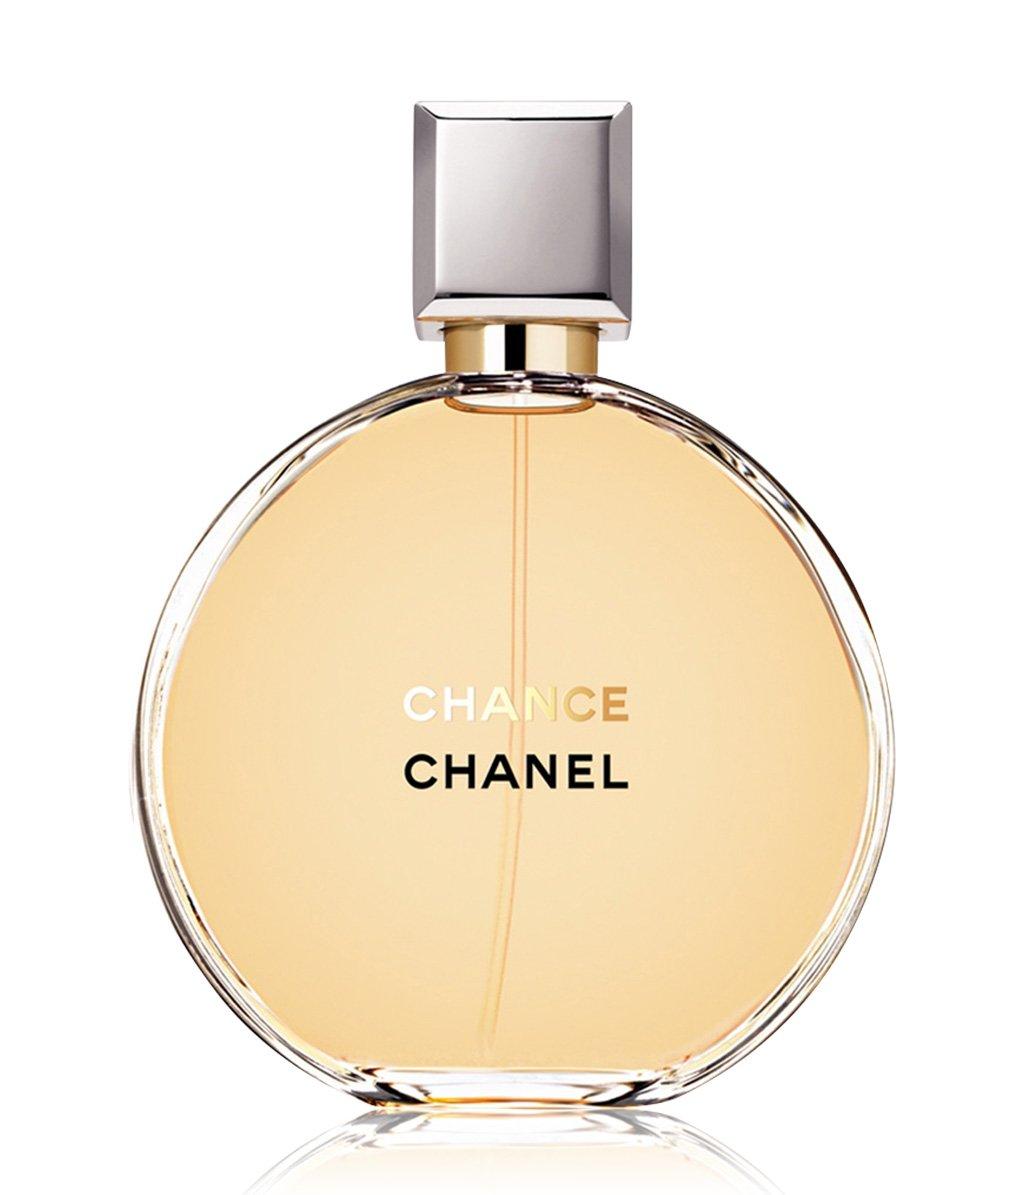 chanel chance parfum bestellen chanel shop flaconi. Black Bedroom Furniture Sets. Home Design Ideas